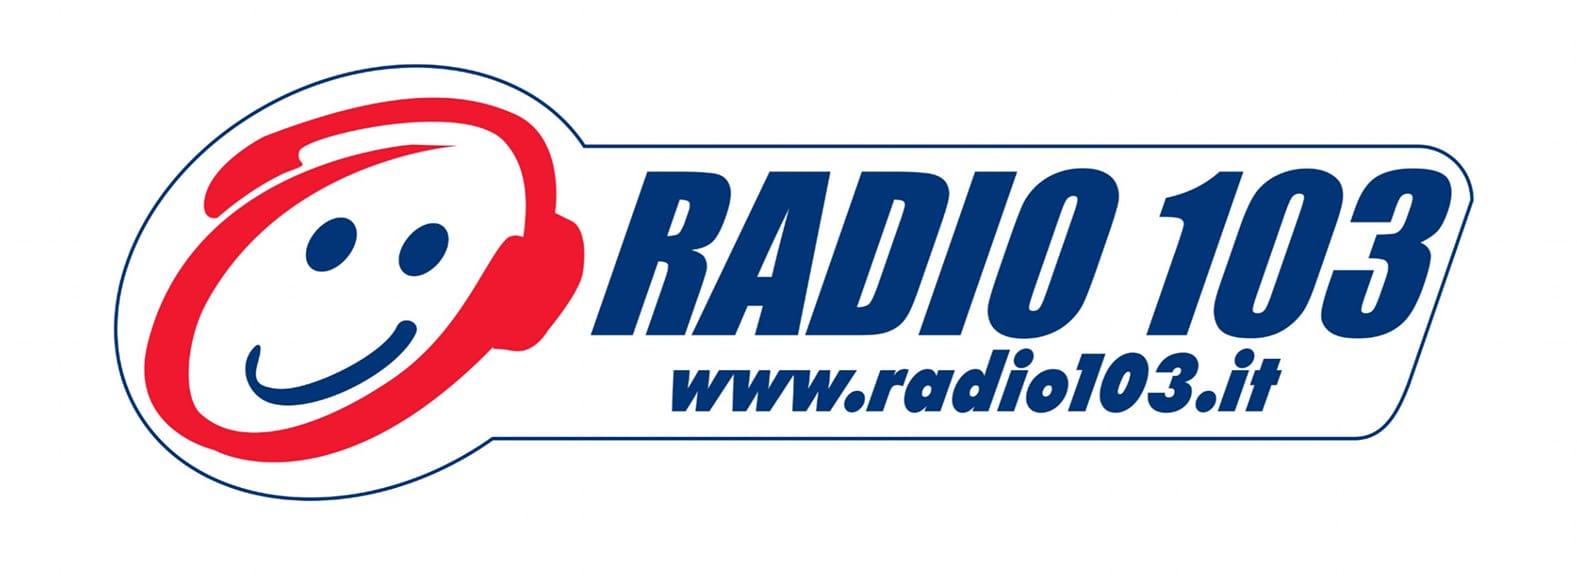 radio 103 - Radio locali. Liguria: a Radio Savona Sound la nuova proprieta' provoca un 'terremoto' e se ne vanno le voci 'storiche'. Intanto Radio 103 passa a Onda Ligure